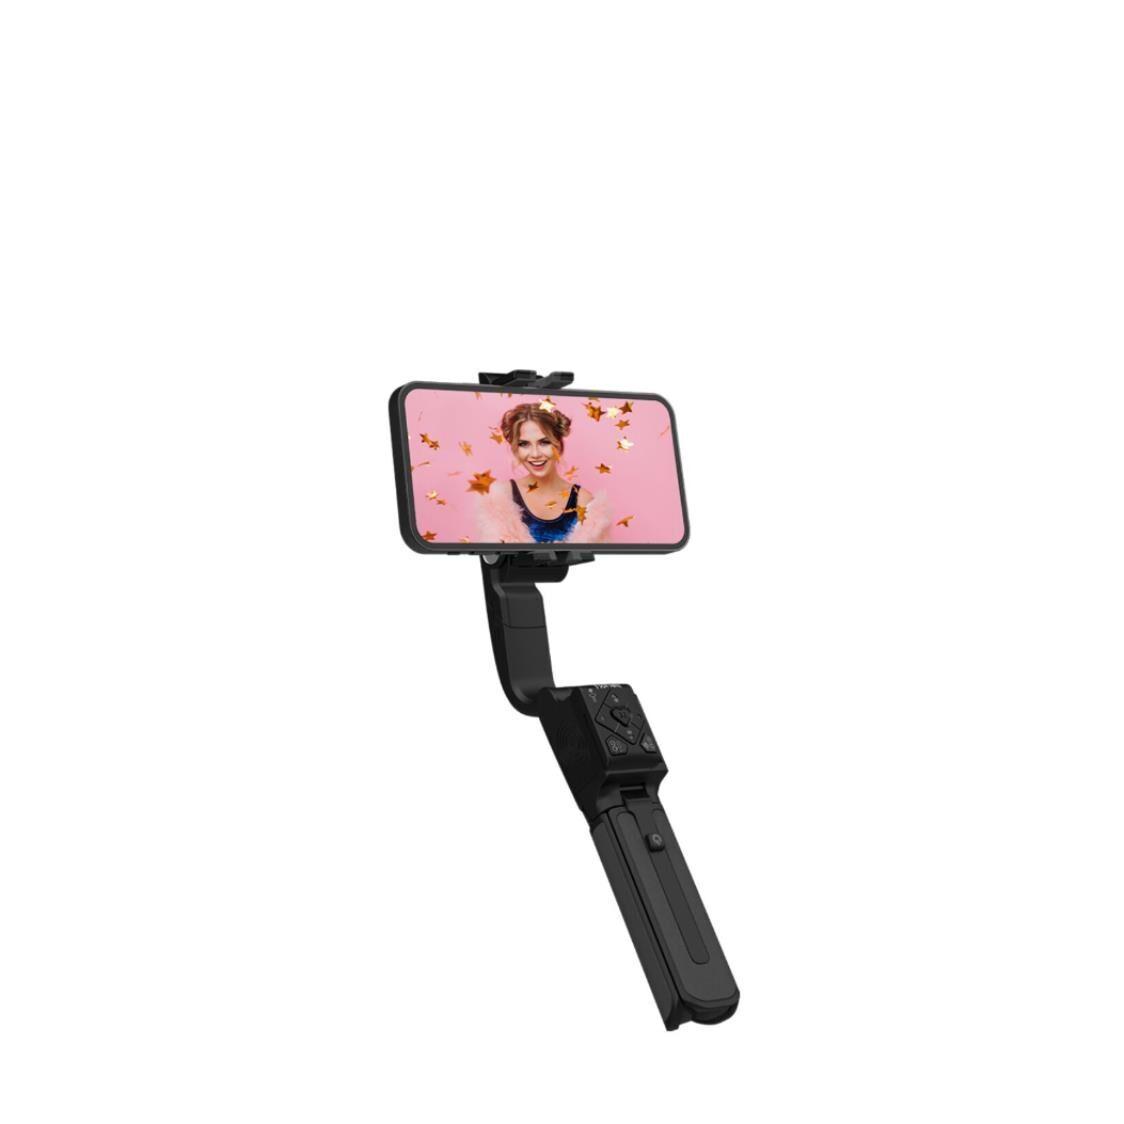 Hohem iSteady Q Versatile Selfie Stick - Black